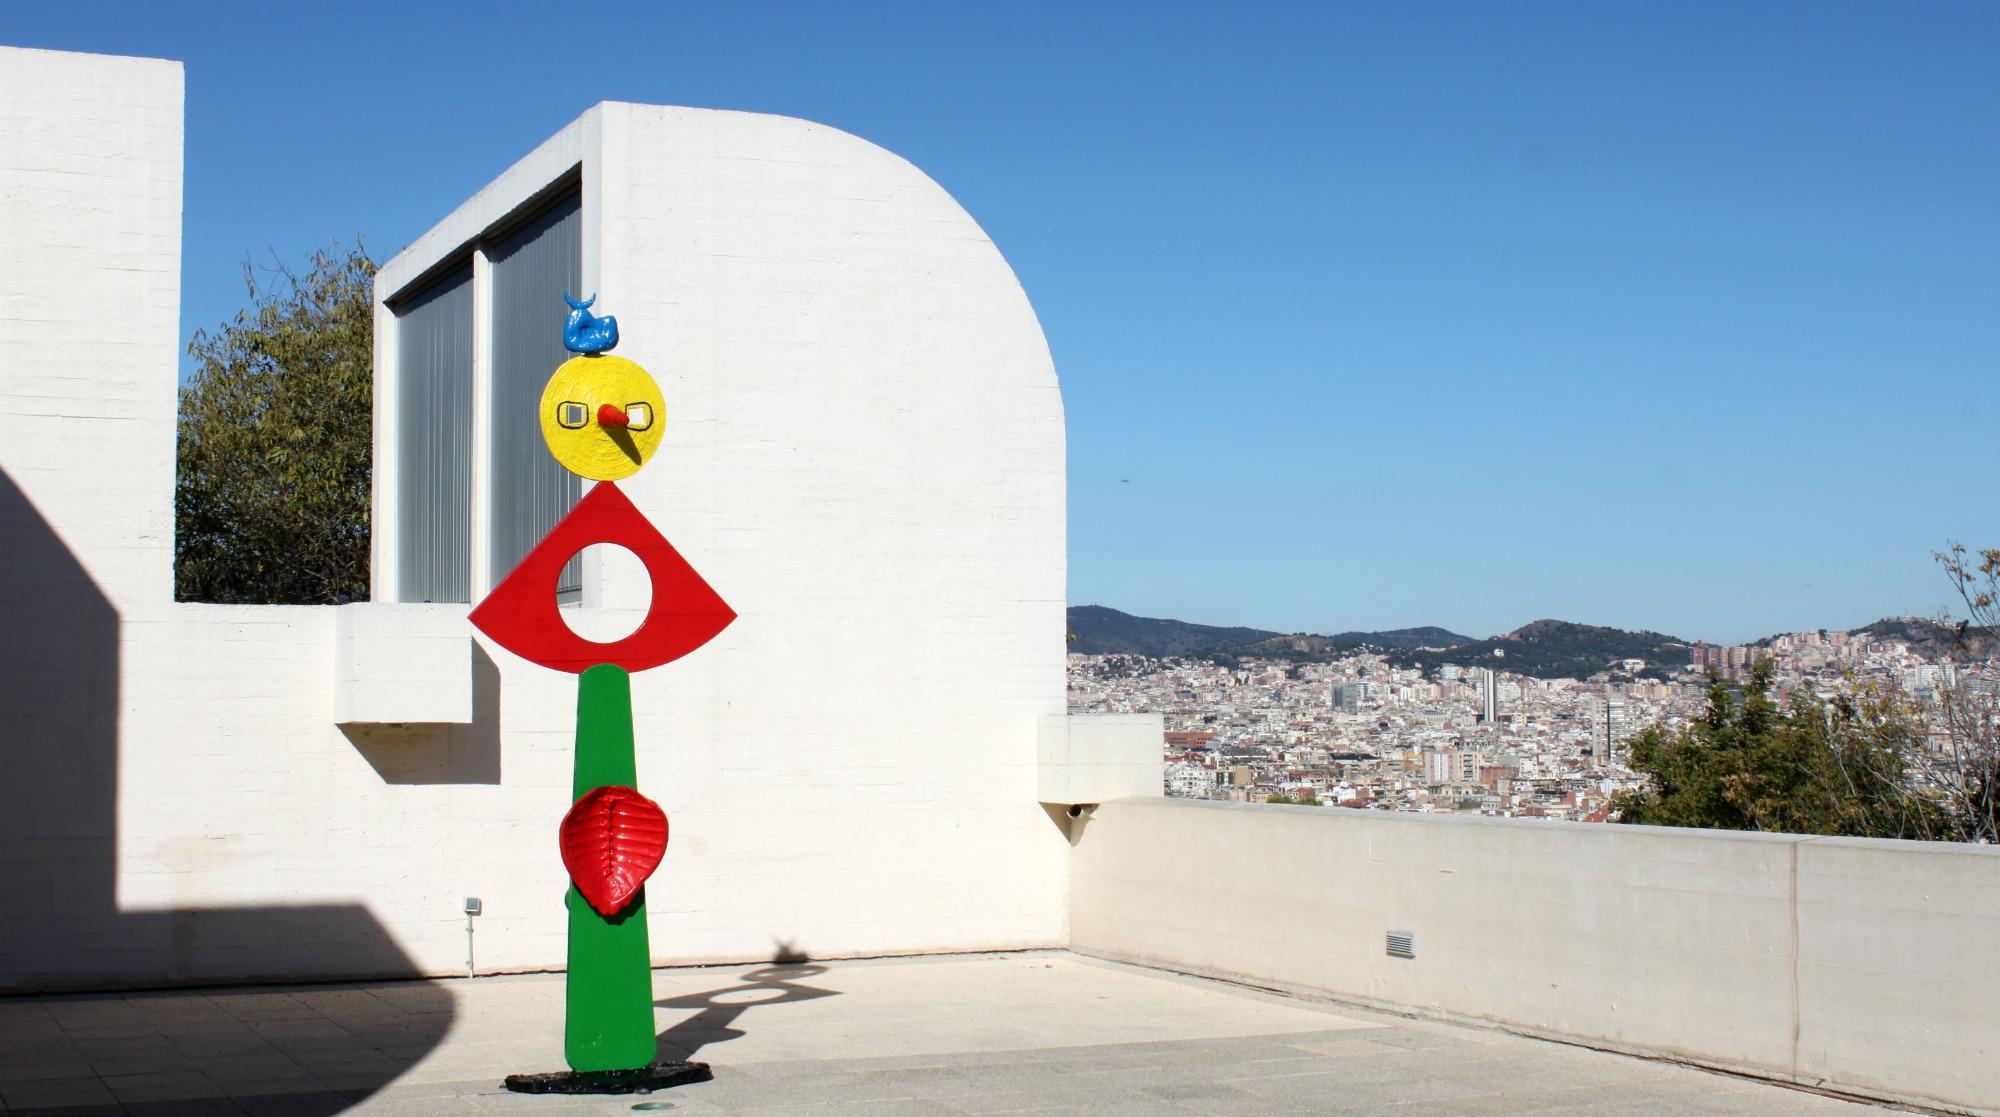 Fundacío Joan Miró